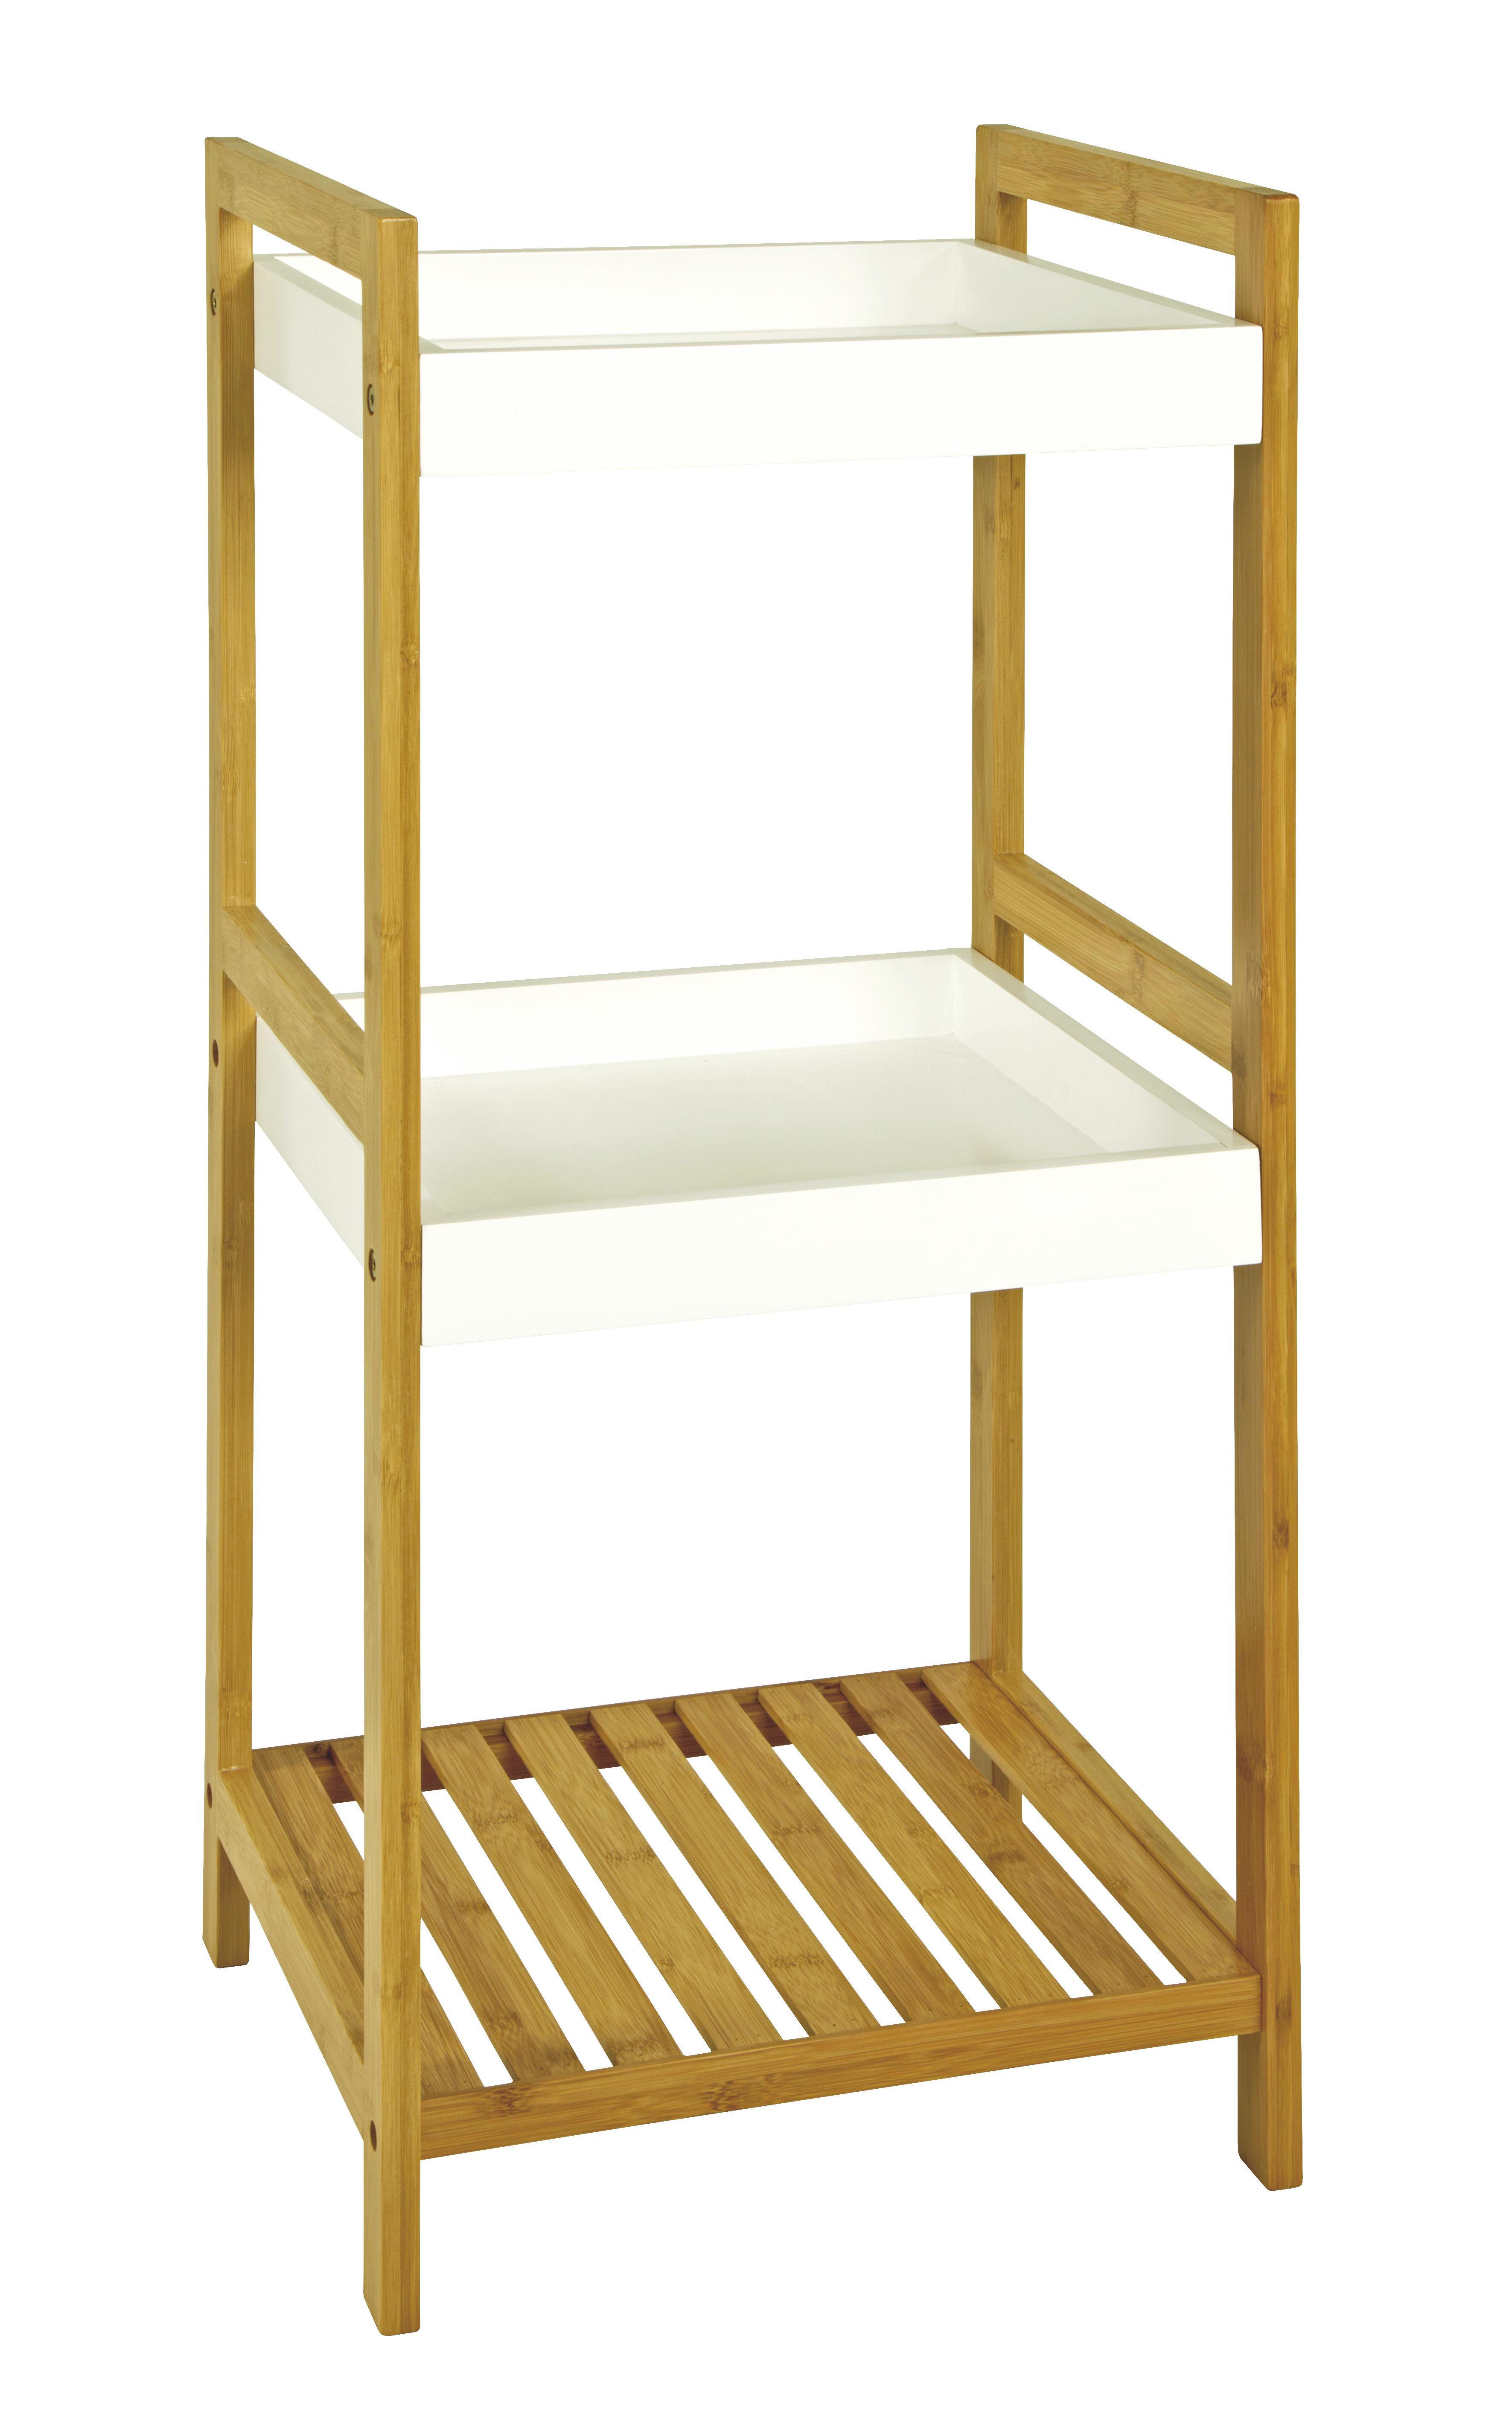 REGAL Bambus Naturfarben, Weiß - Naturfarben/Weiß, Basics, Holz/Holzwerkstoff (36/86/33cm)